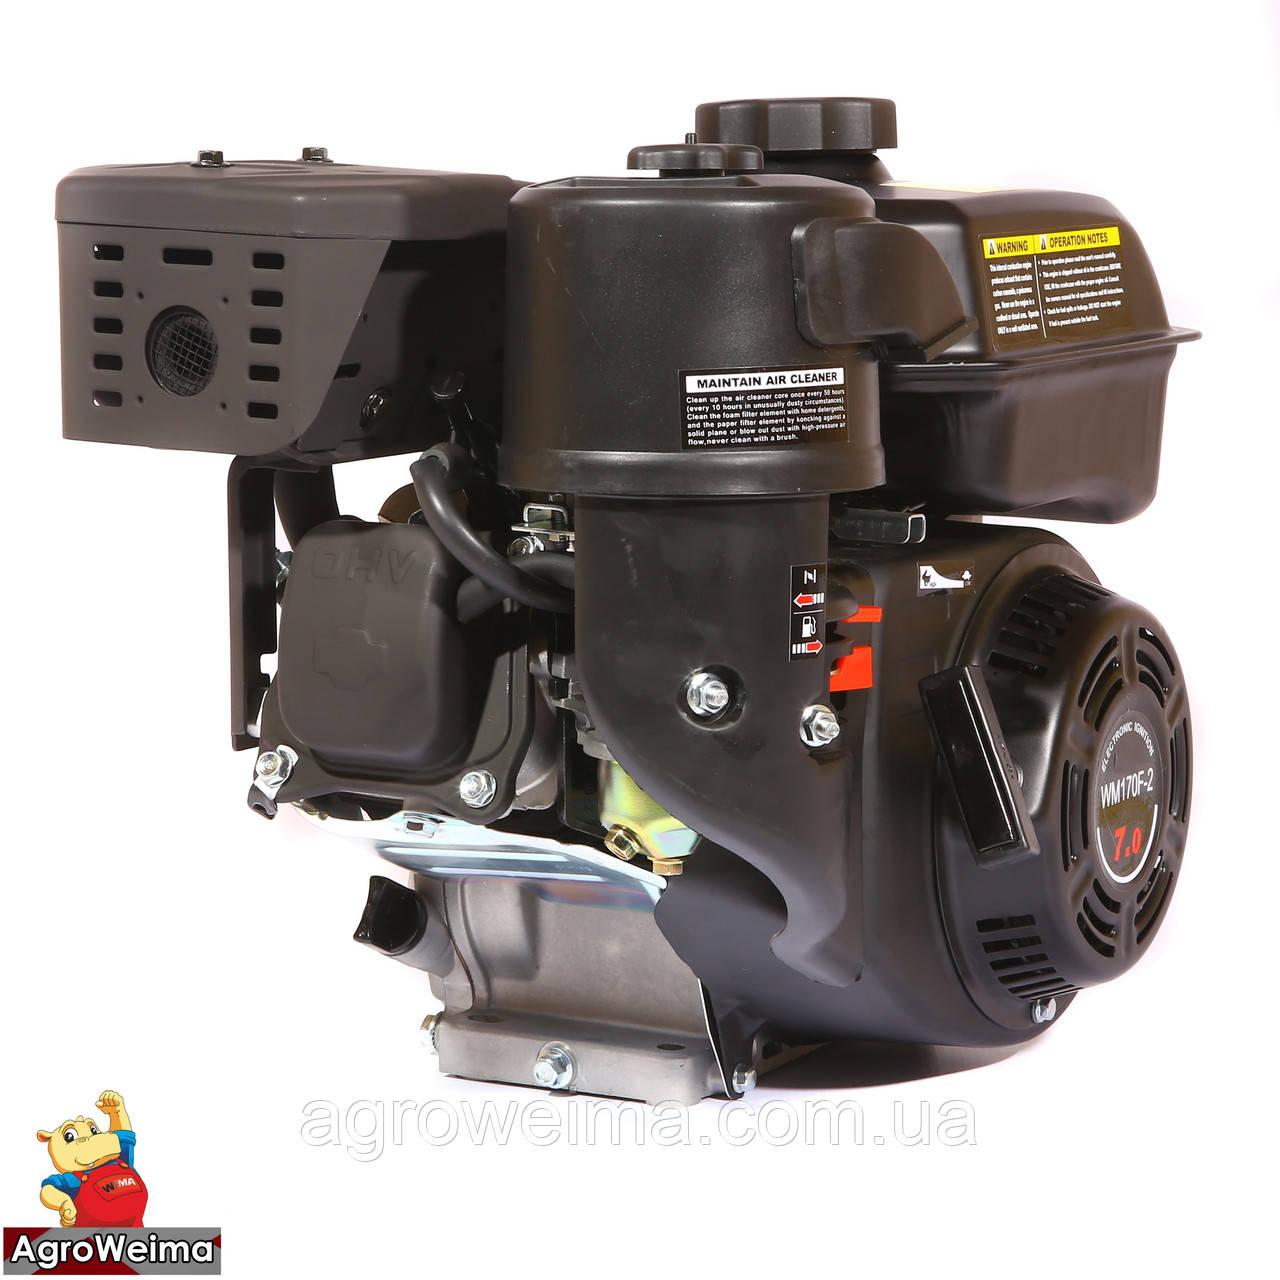 Двигун WEIMA WM170F-1050(R) NEW (для WM1050 Favorit, 1800об/м), бенз 7.0 л. с.